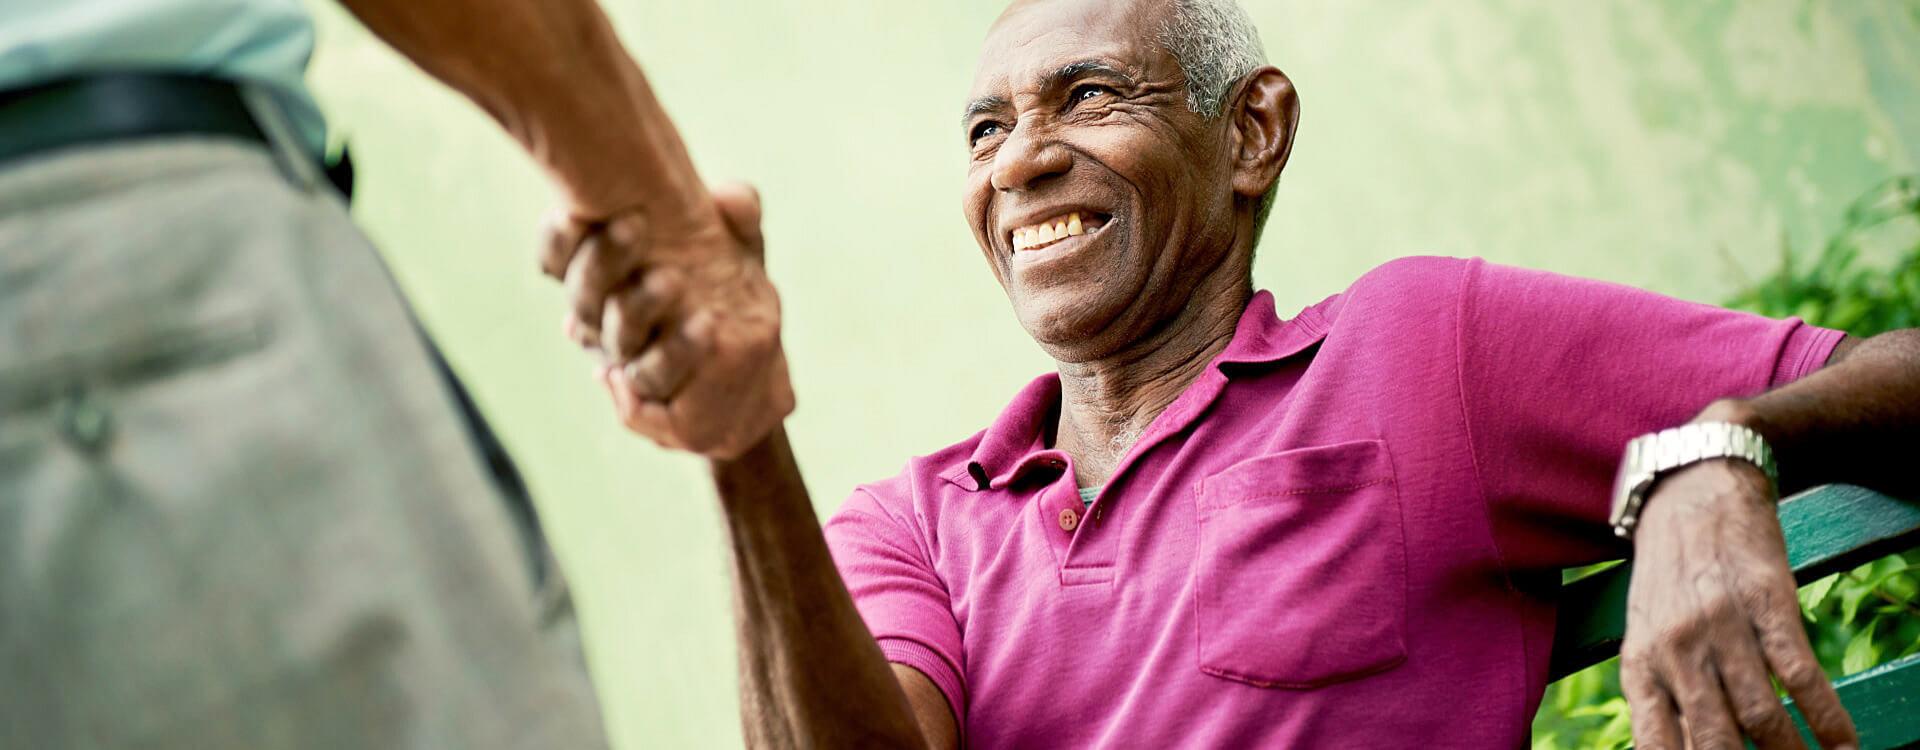 happy senior african american